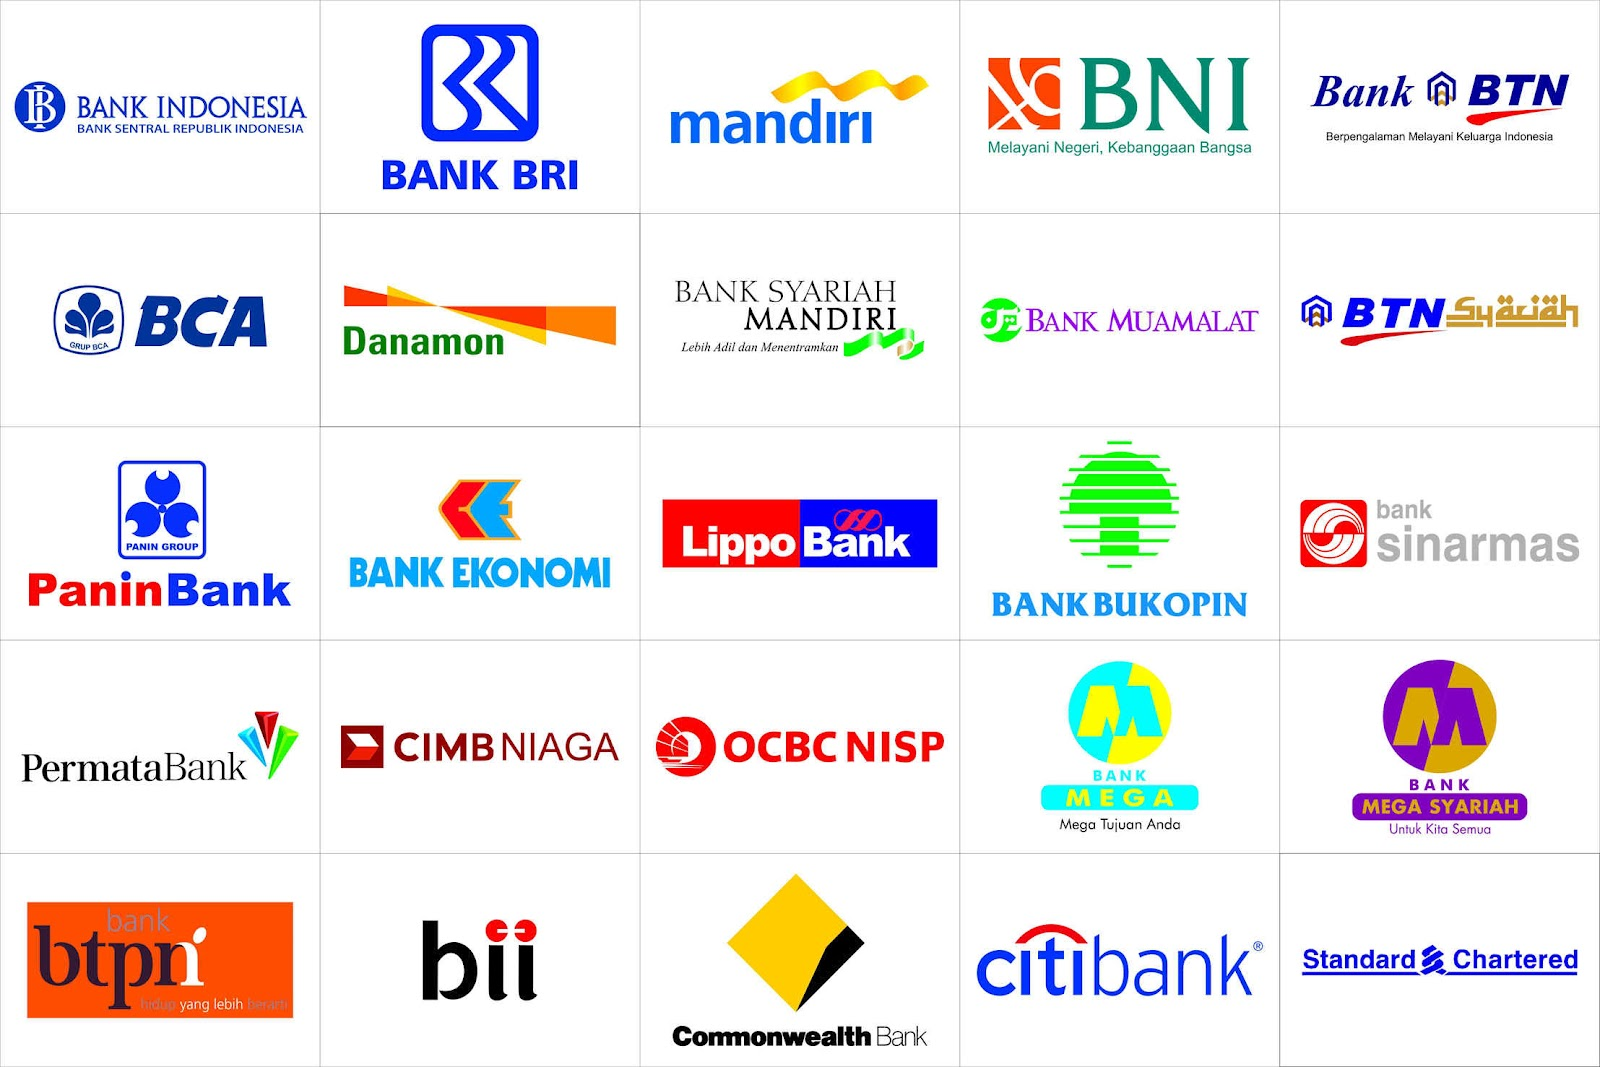 Kumpulan Kode Transfer Antar Bank Seindonesia - Arsip.Co.Id